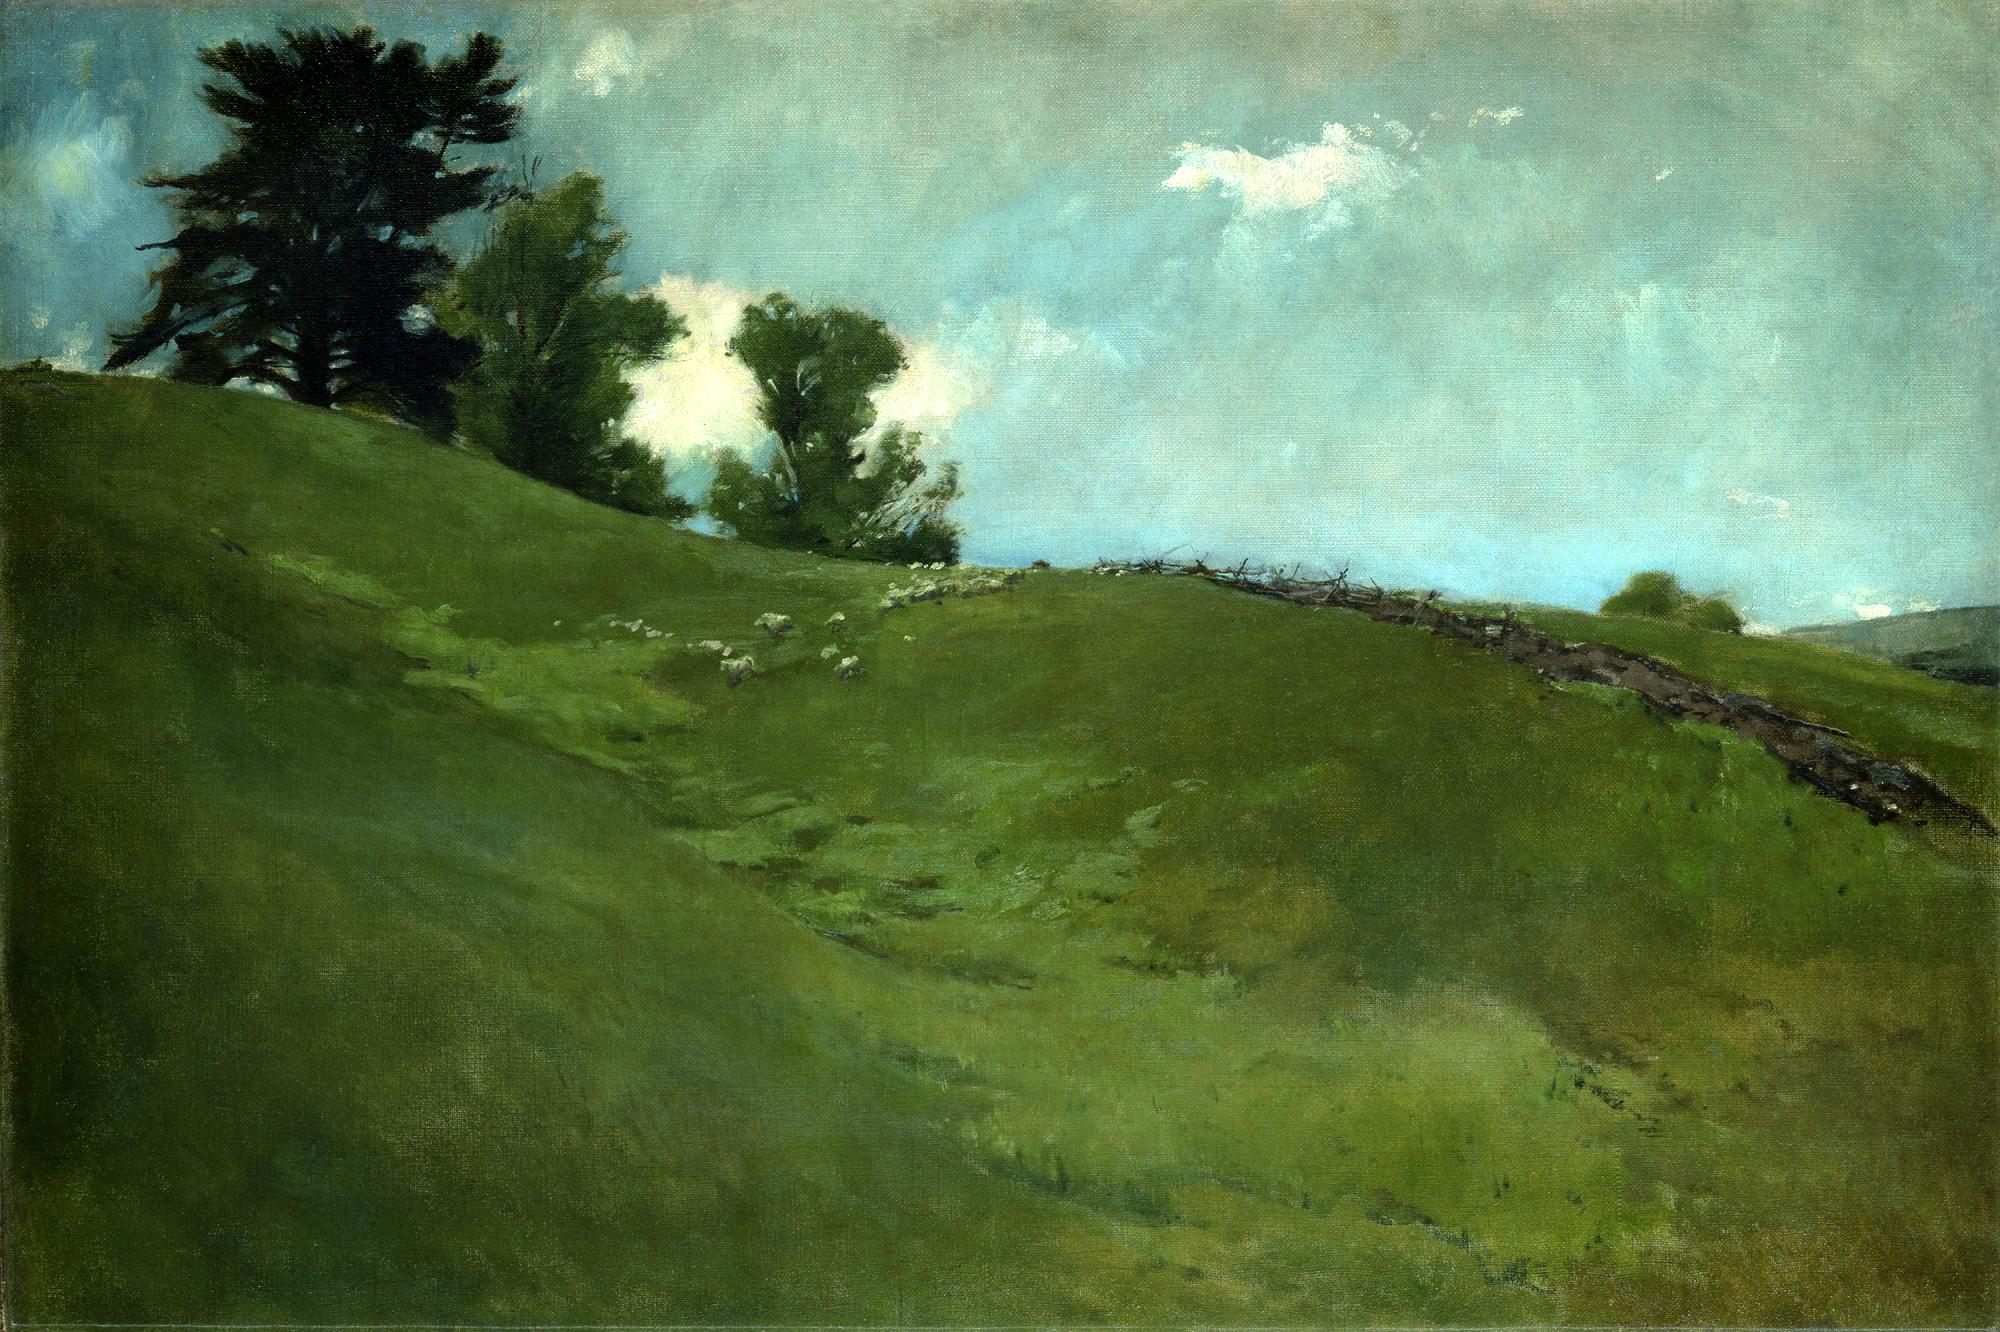 Landscape, Cornish, N.H. by John White Alexander